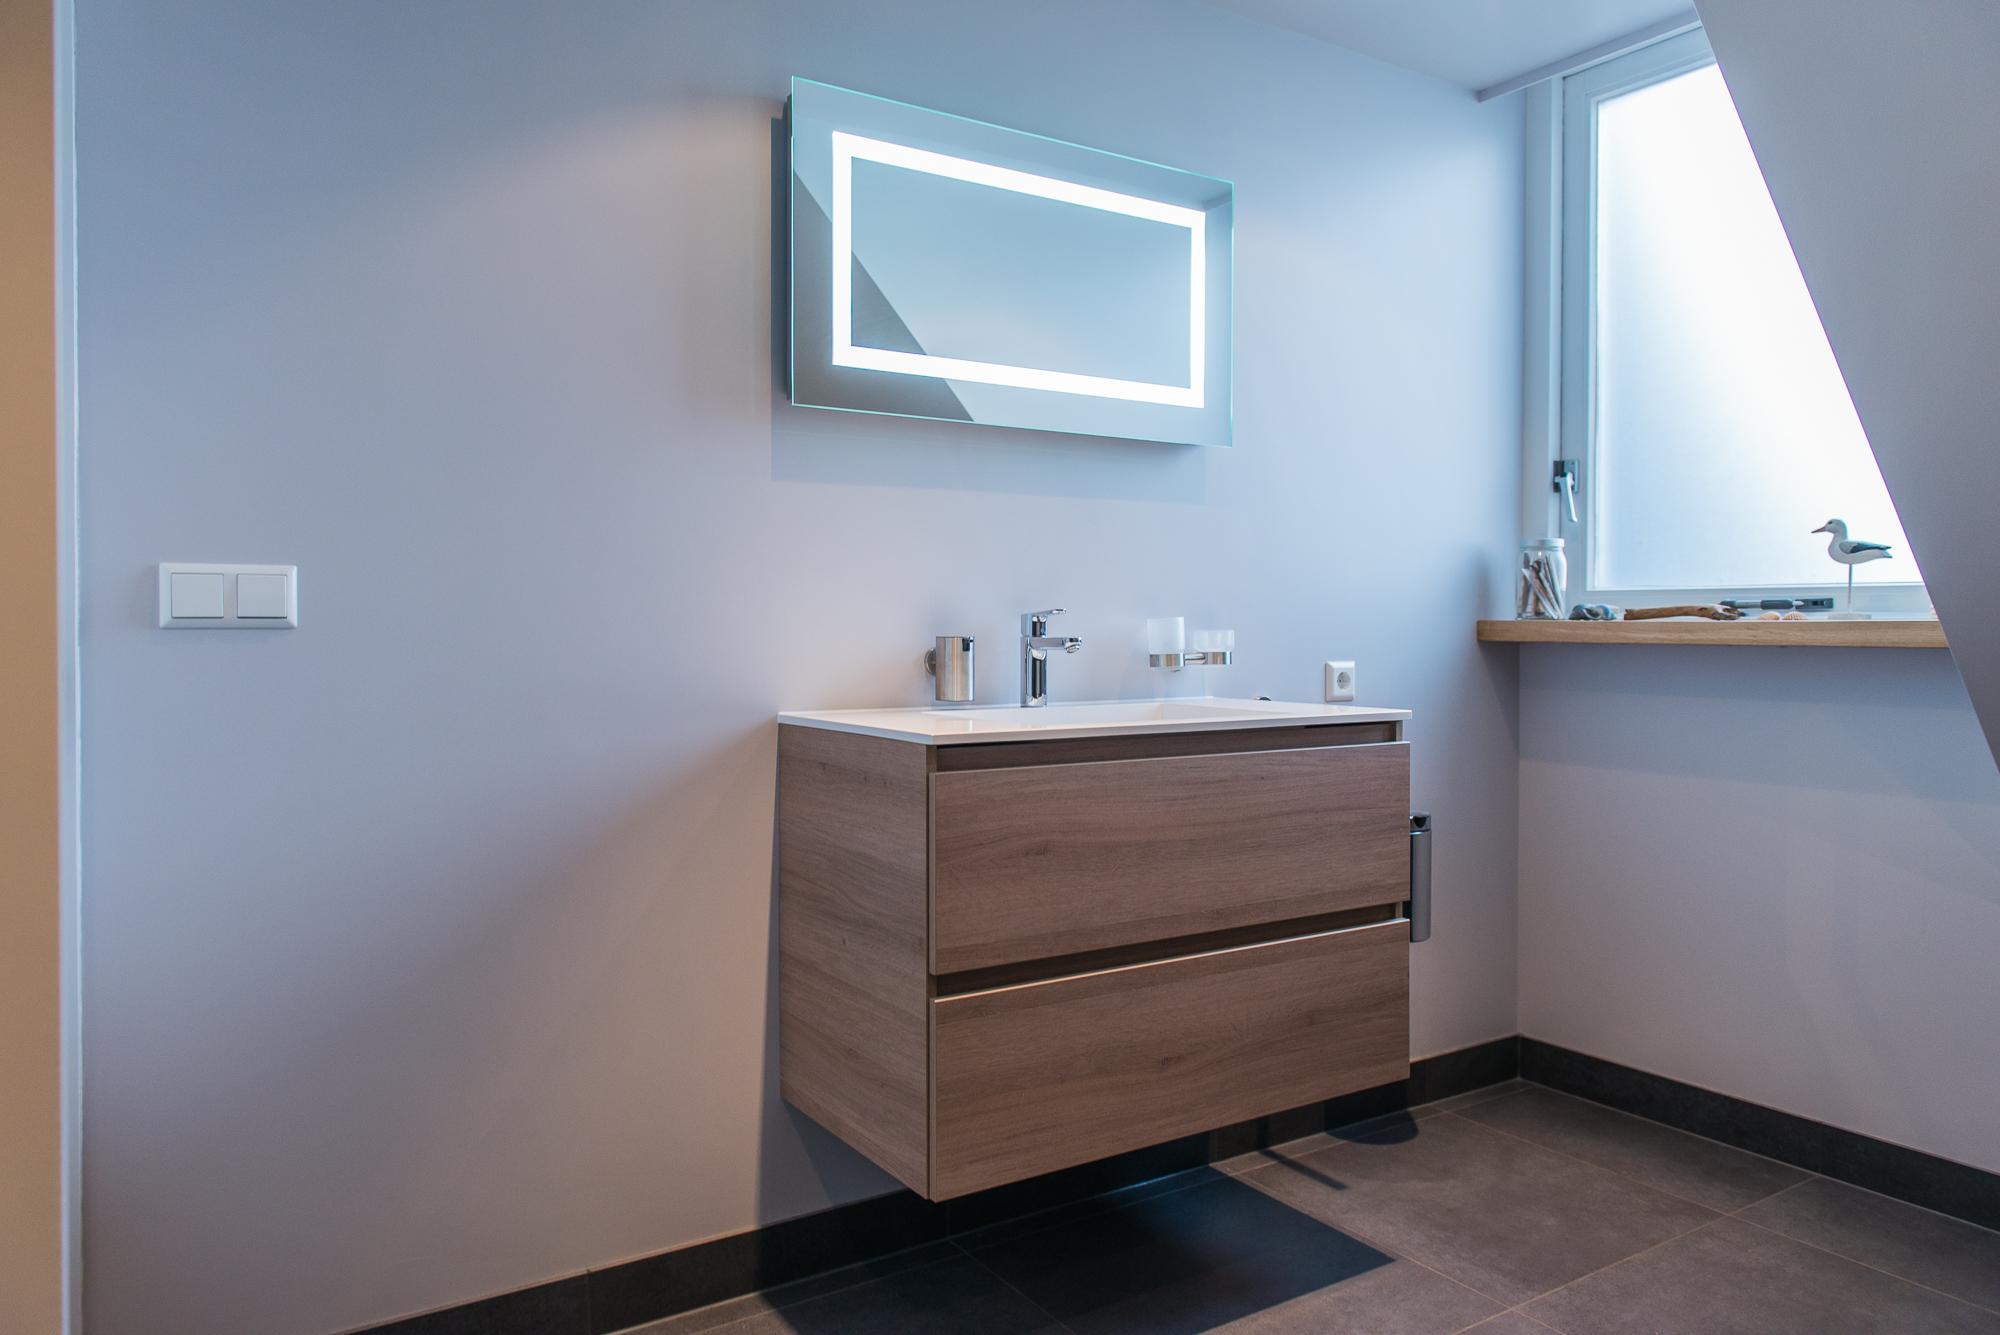 een nieuwe badkamer � ariebruinsma